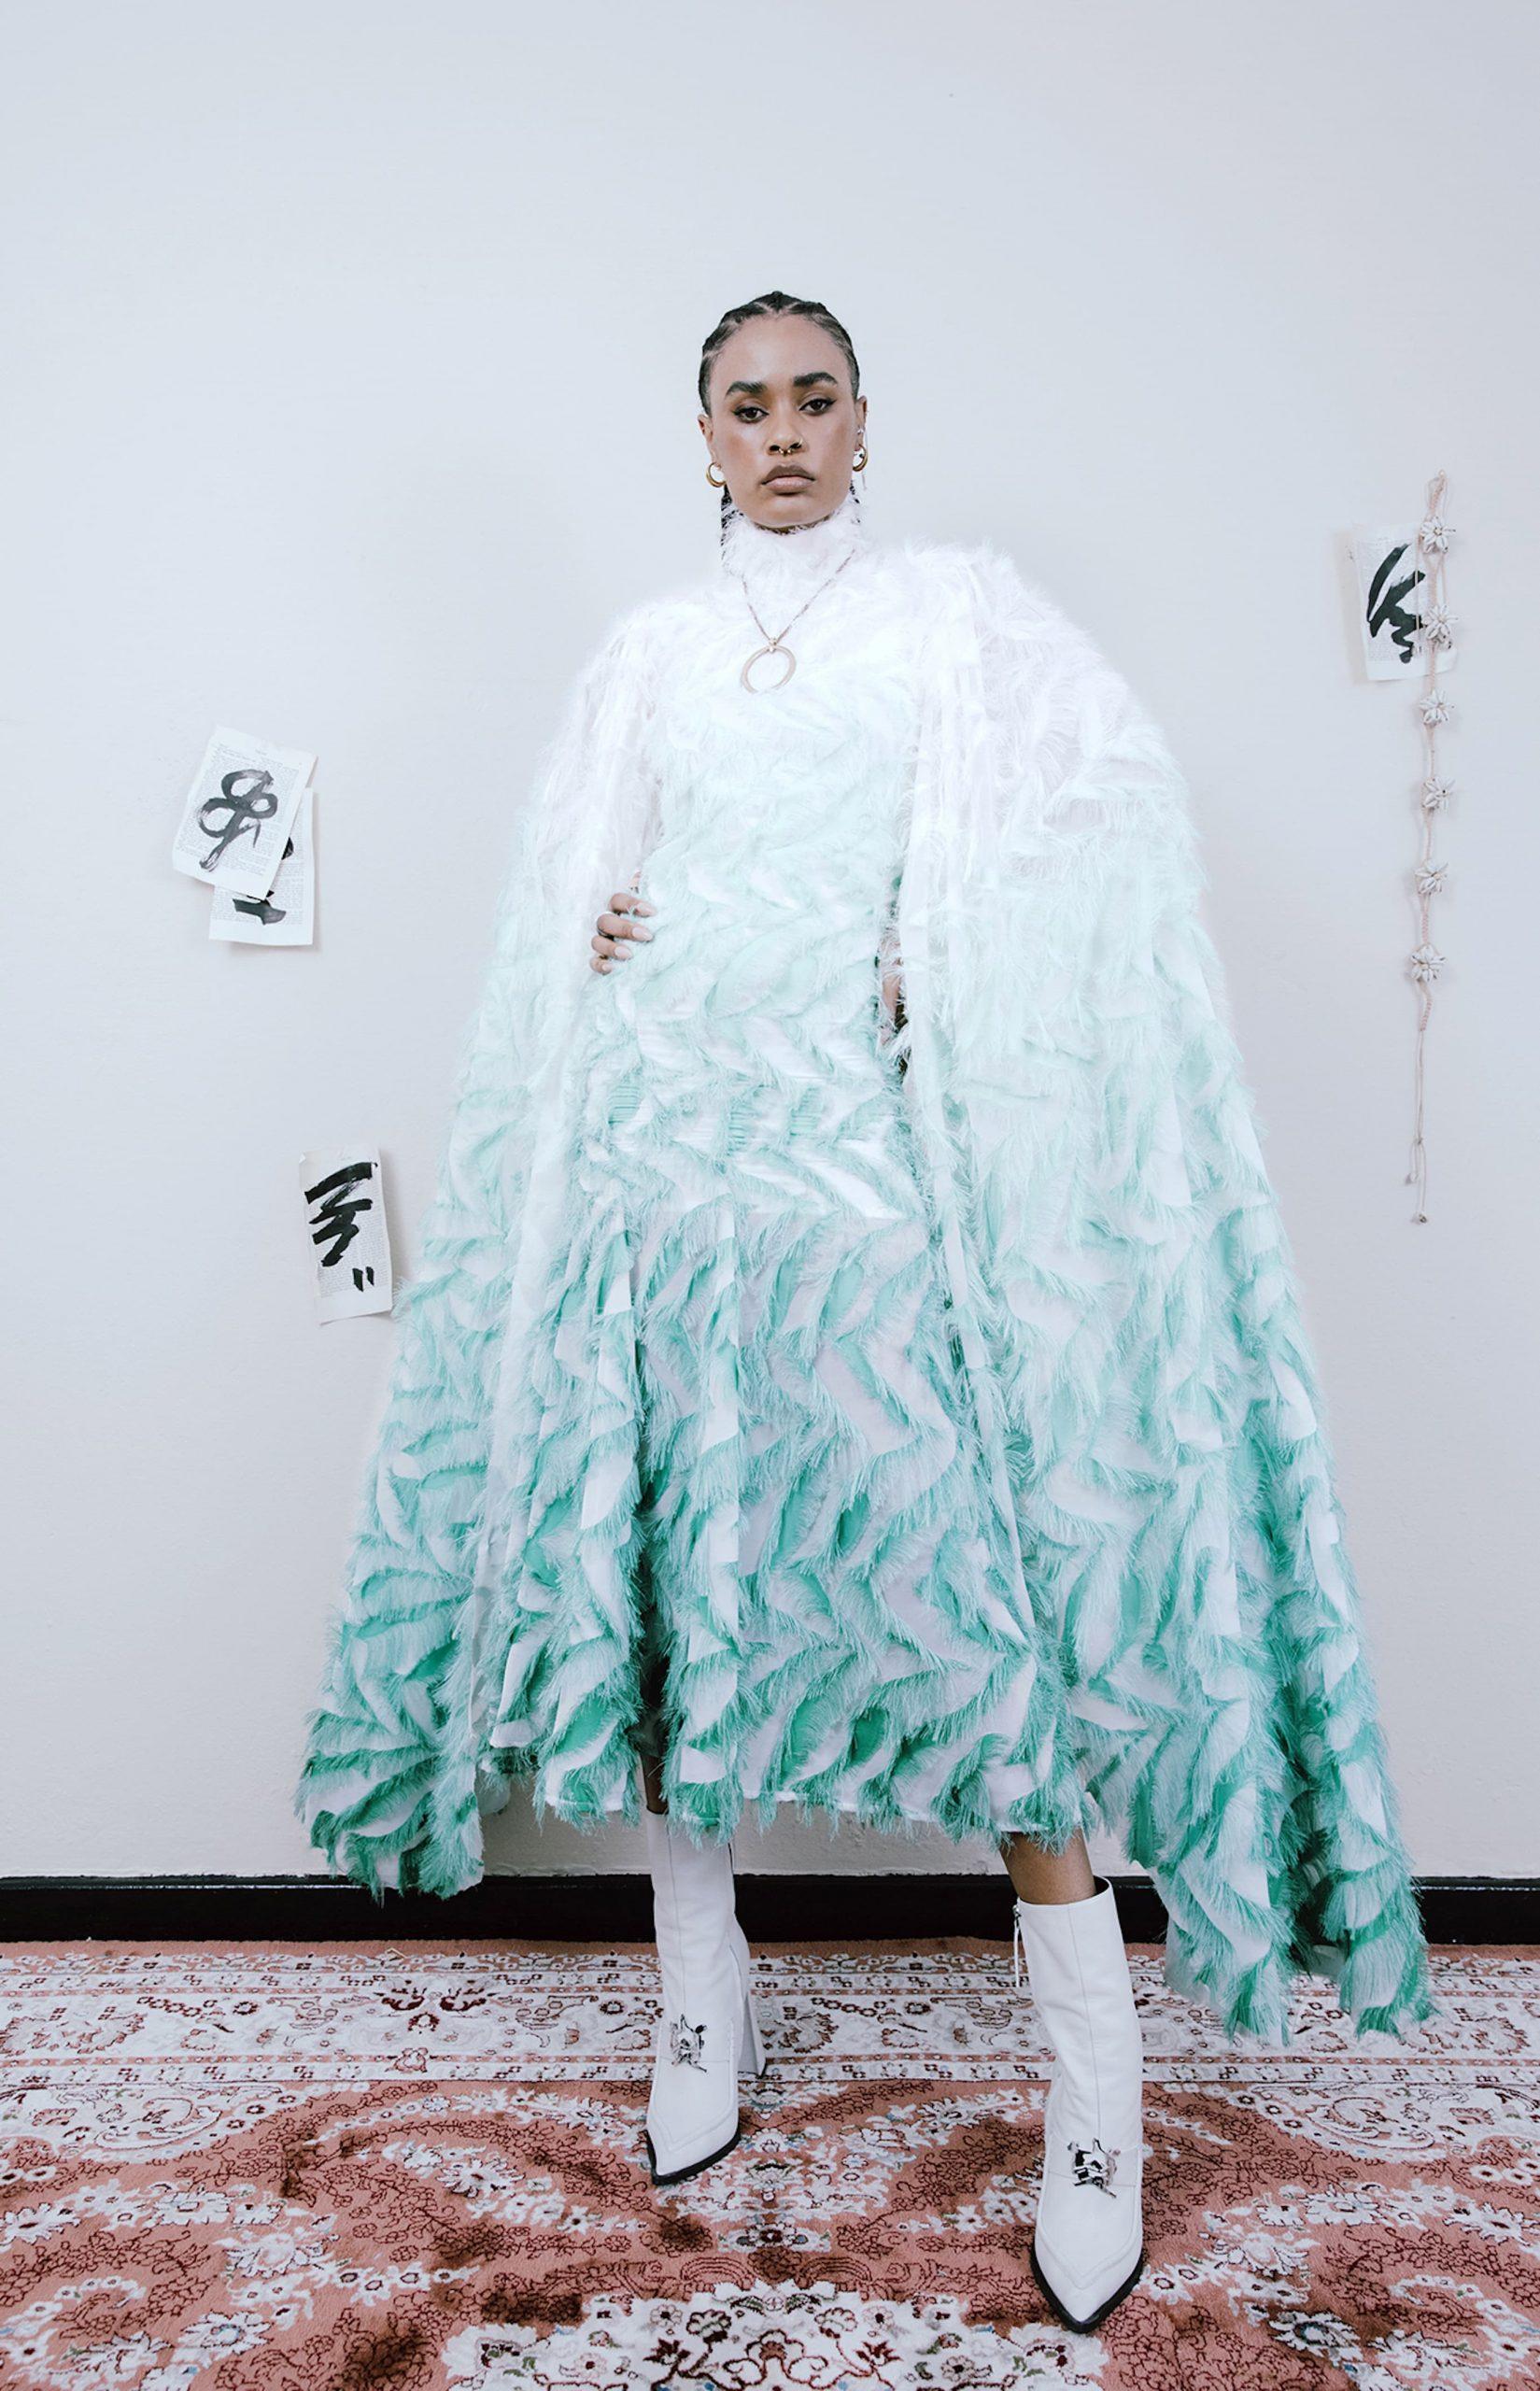 Marine Serre, Kochè, Weinsanto, Ottolinger, Thebe Magugu, Dawei Studio, Heliot Emil, Wataru Tominaga, & Institut Français De La Mode Fall 2021 Fashion Show Review